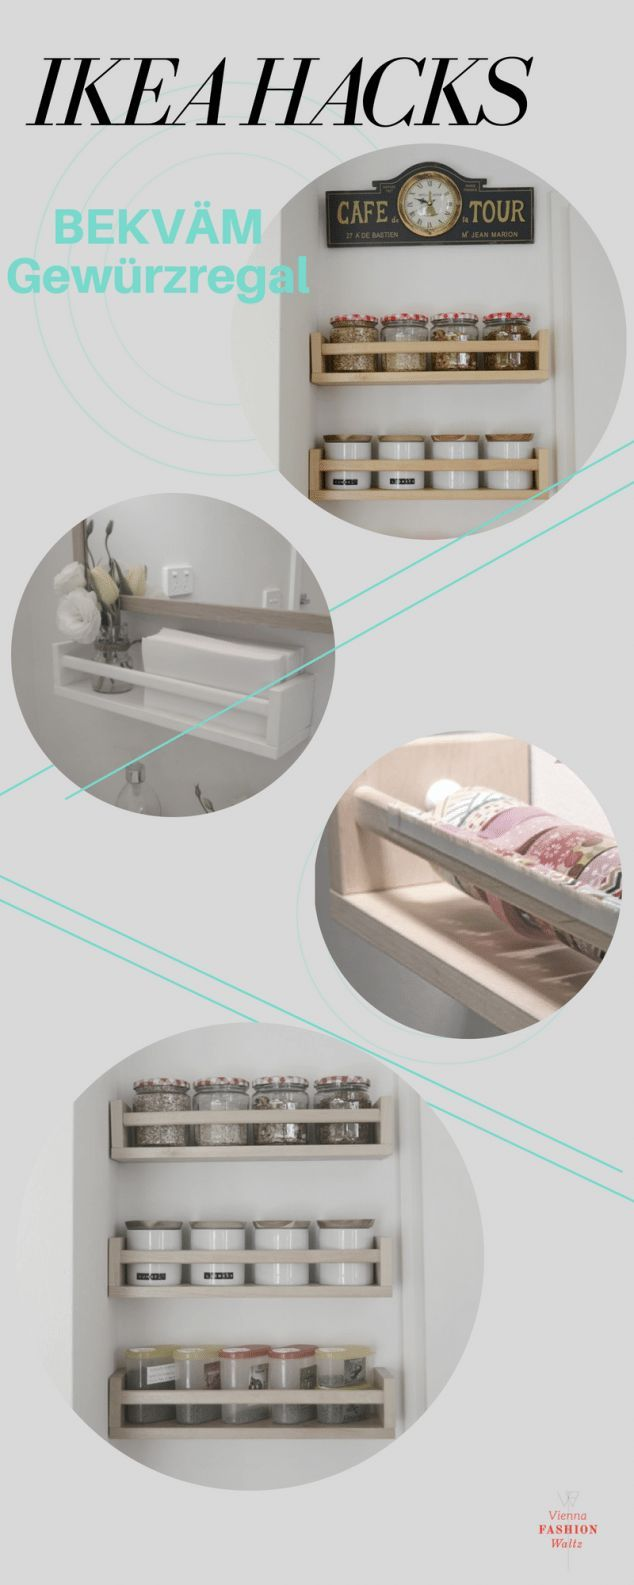 DIY Upcycling – BEKVÄM Gewürzregal [Ikea Hackers + weitere